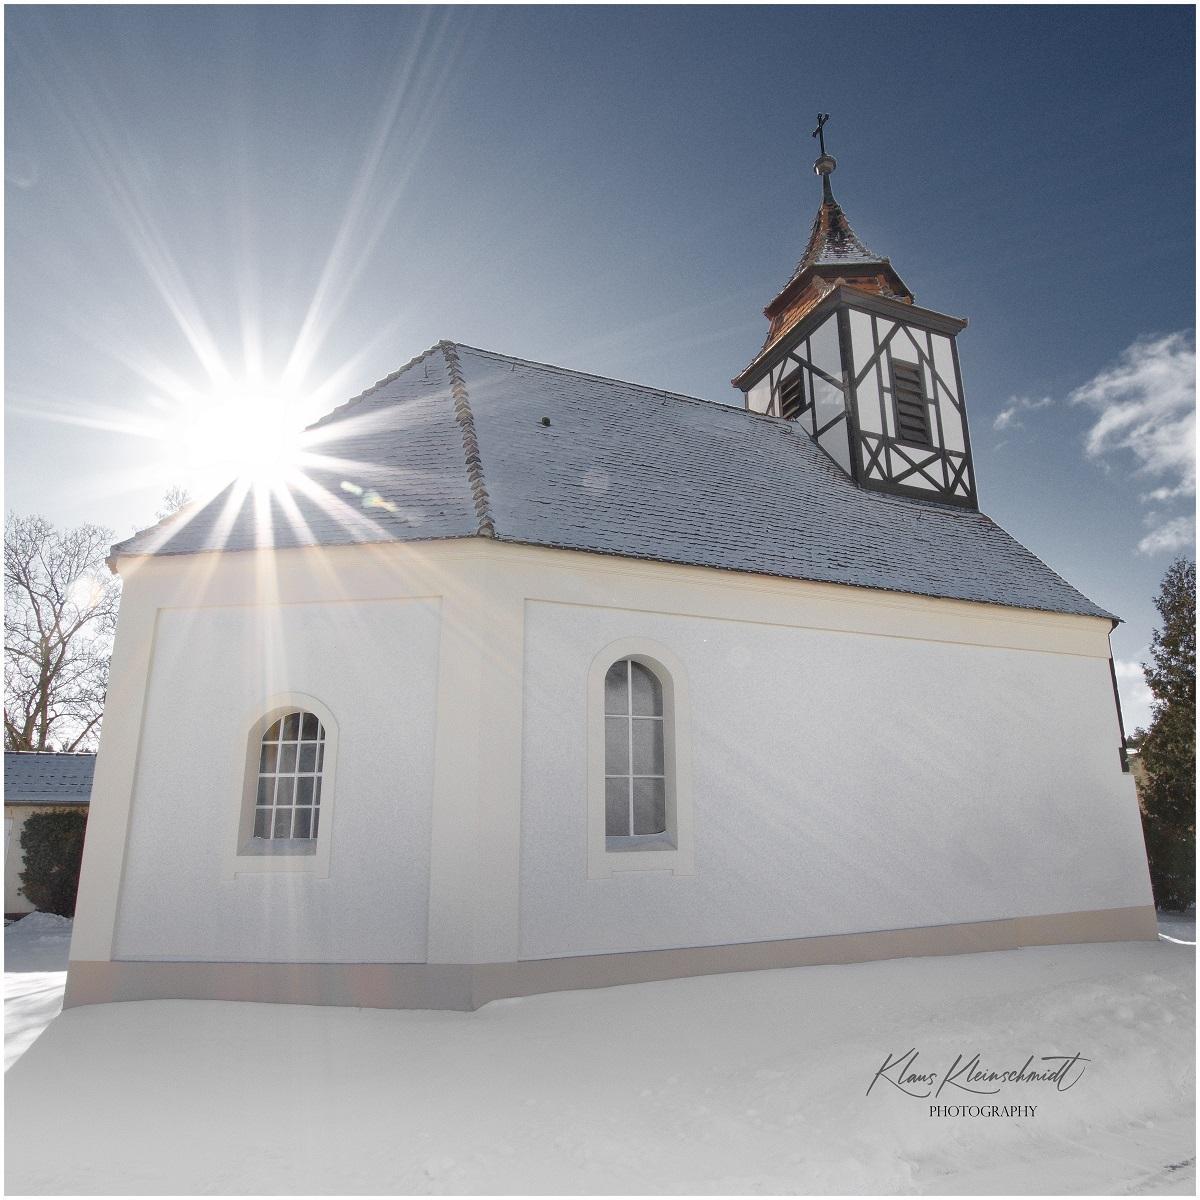 Kirche Klausdorf im Winter (Foto Klaus Kleinschmidt)